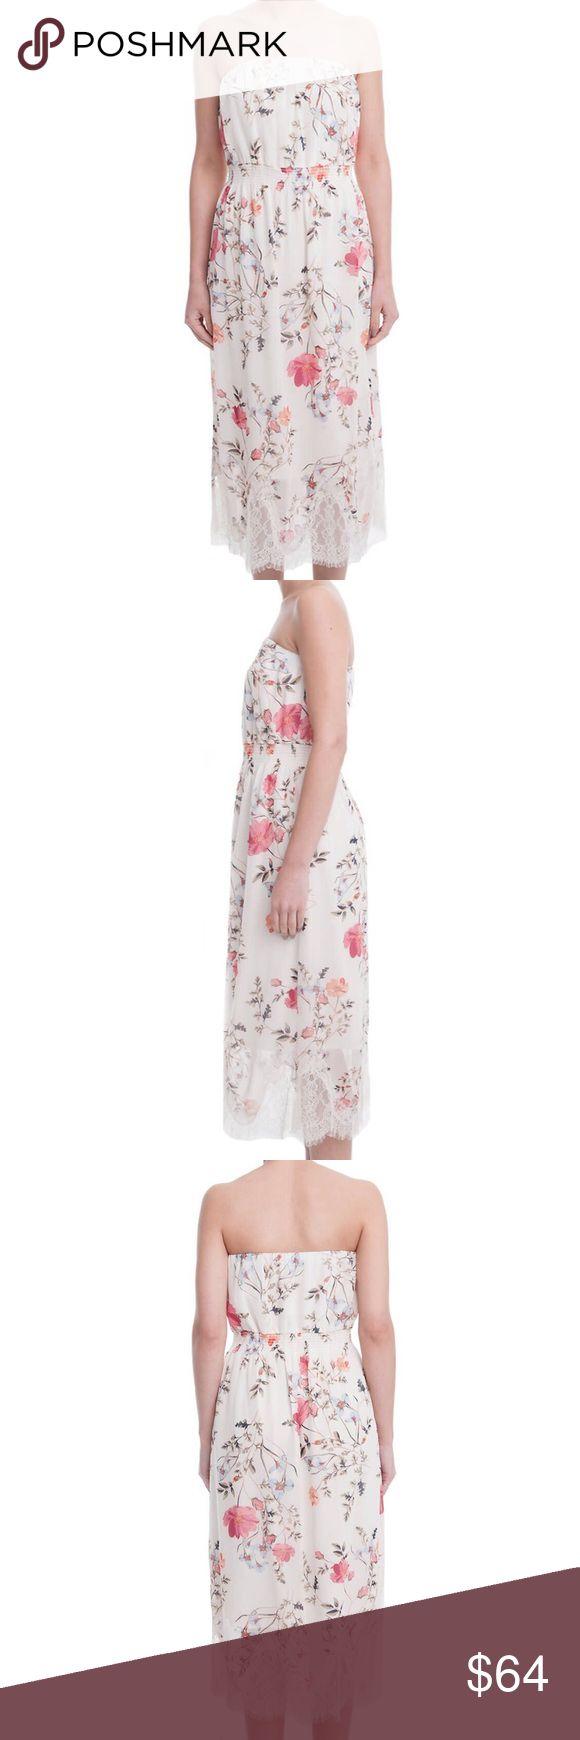 Floral Garden Dress Lush clothing line dress. True to size. Juniors: XS=0-1, S=3-5, M=7-9, L=11-13. Women's: XS=00-0, S=2-4, M=6-8, L=10-12. Lush Dresses Maxi